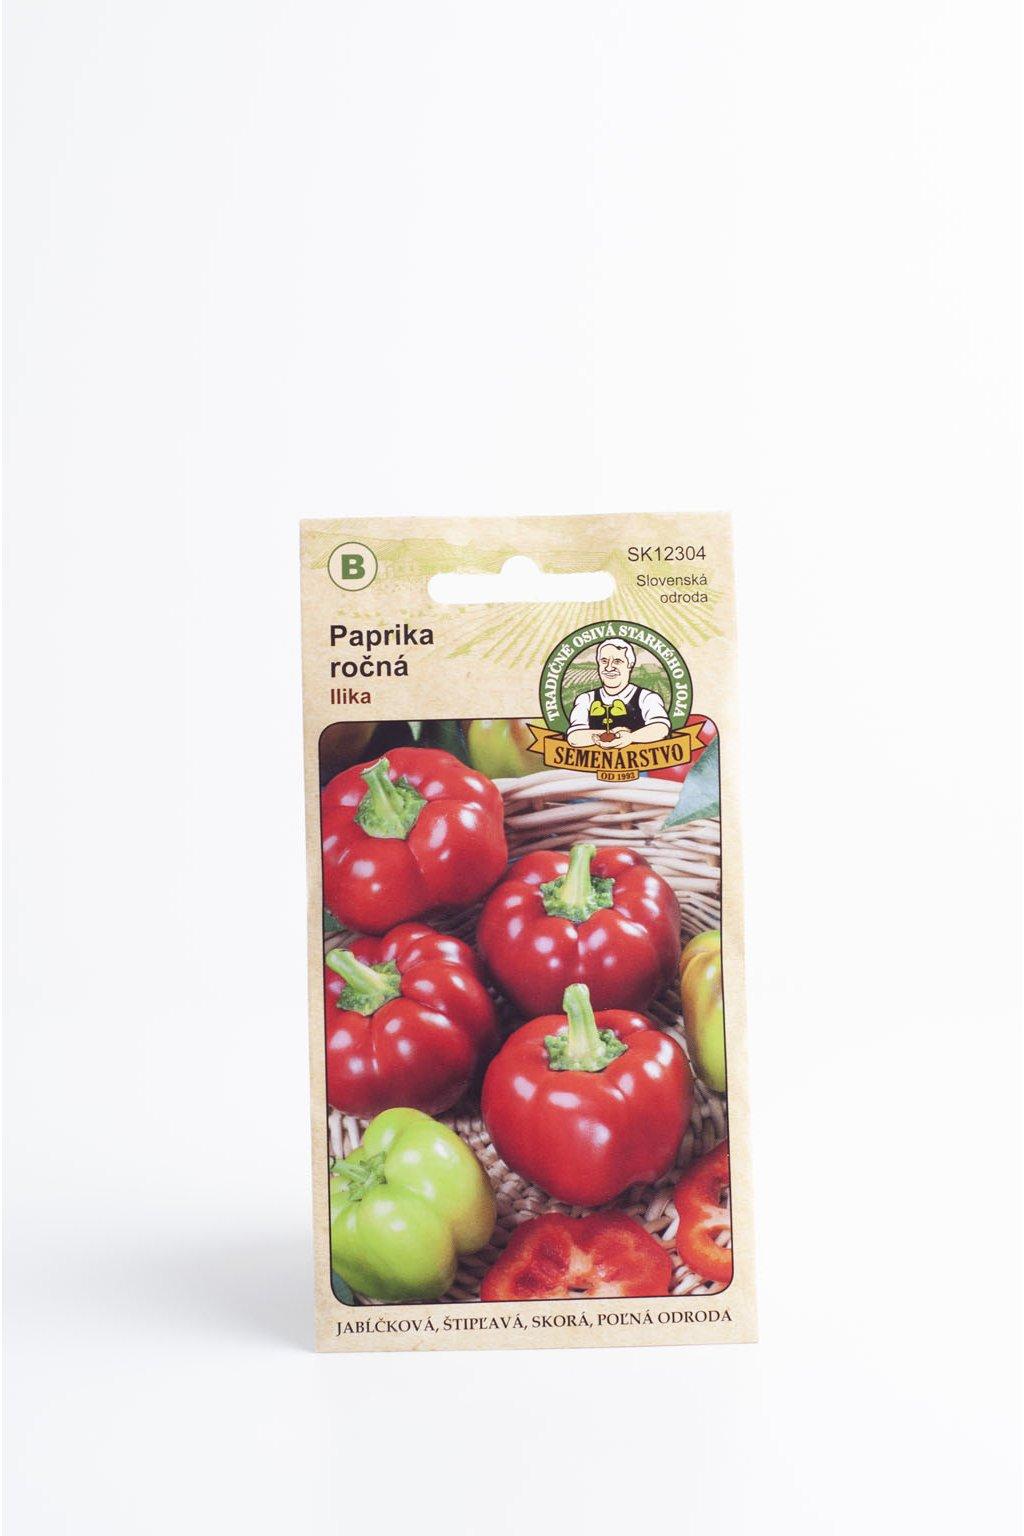 Paprika ročná - Llika